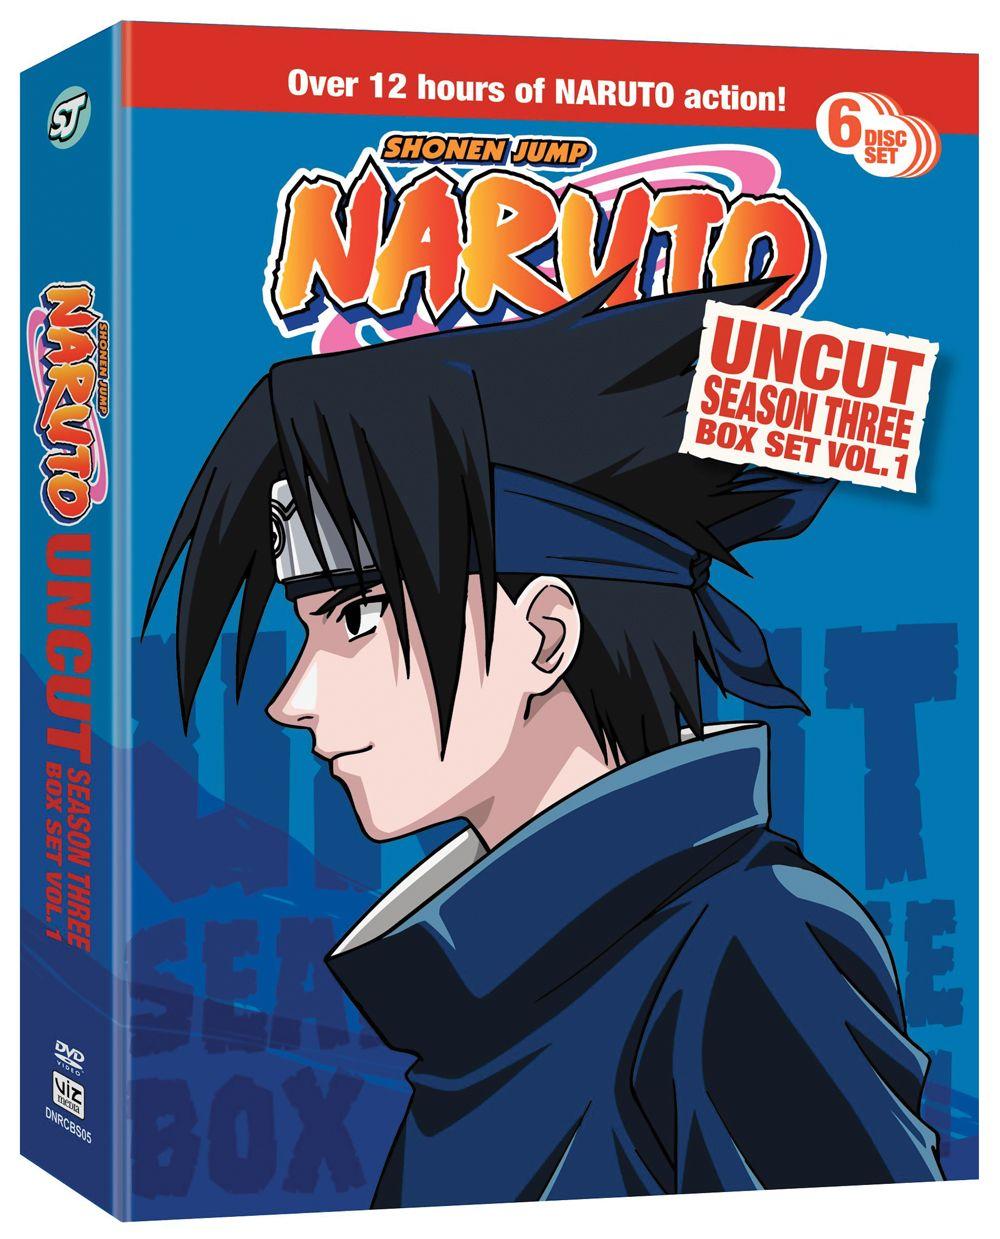 Naruto dvd season 3 box set 1 hyb uncut rightstuf2014